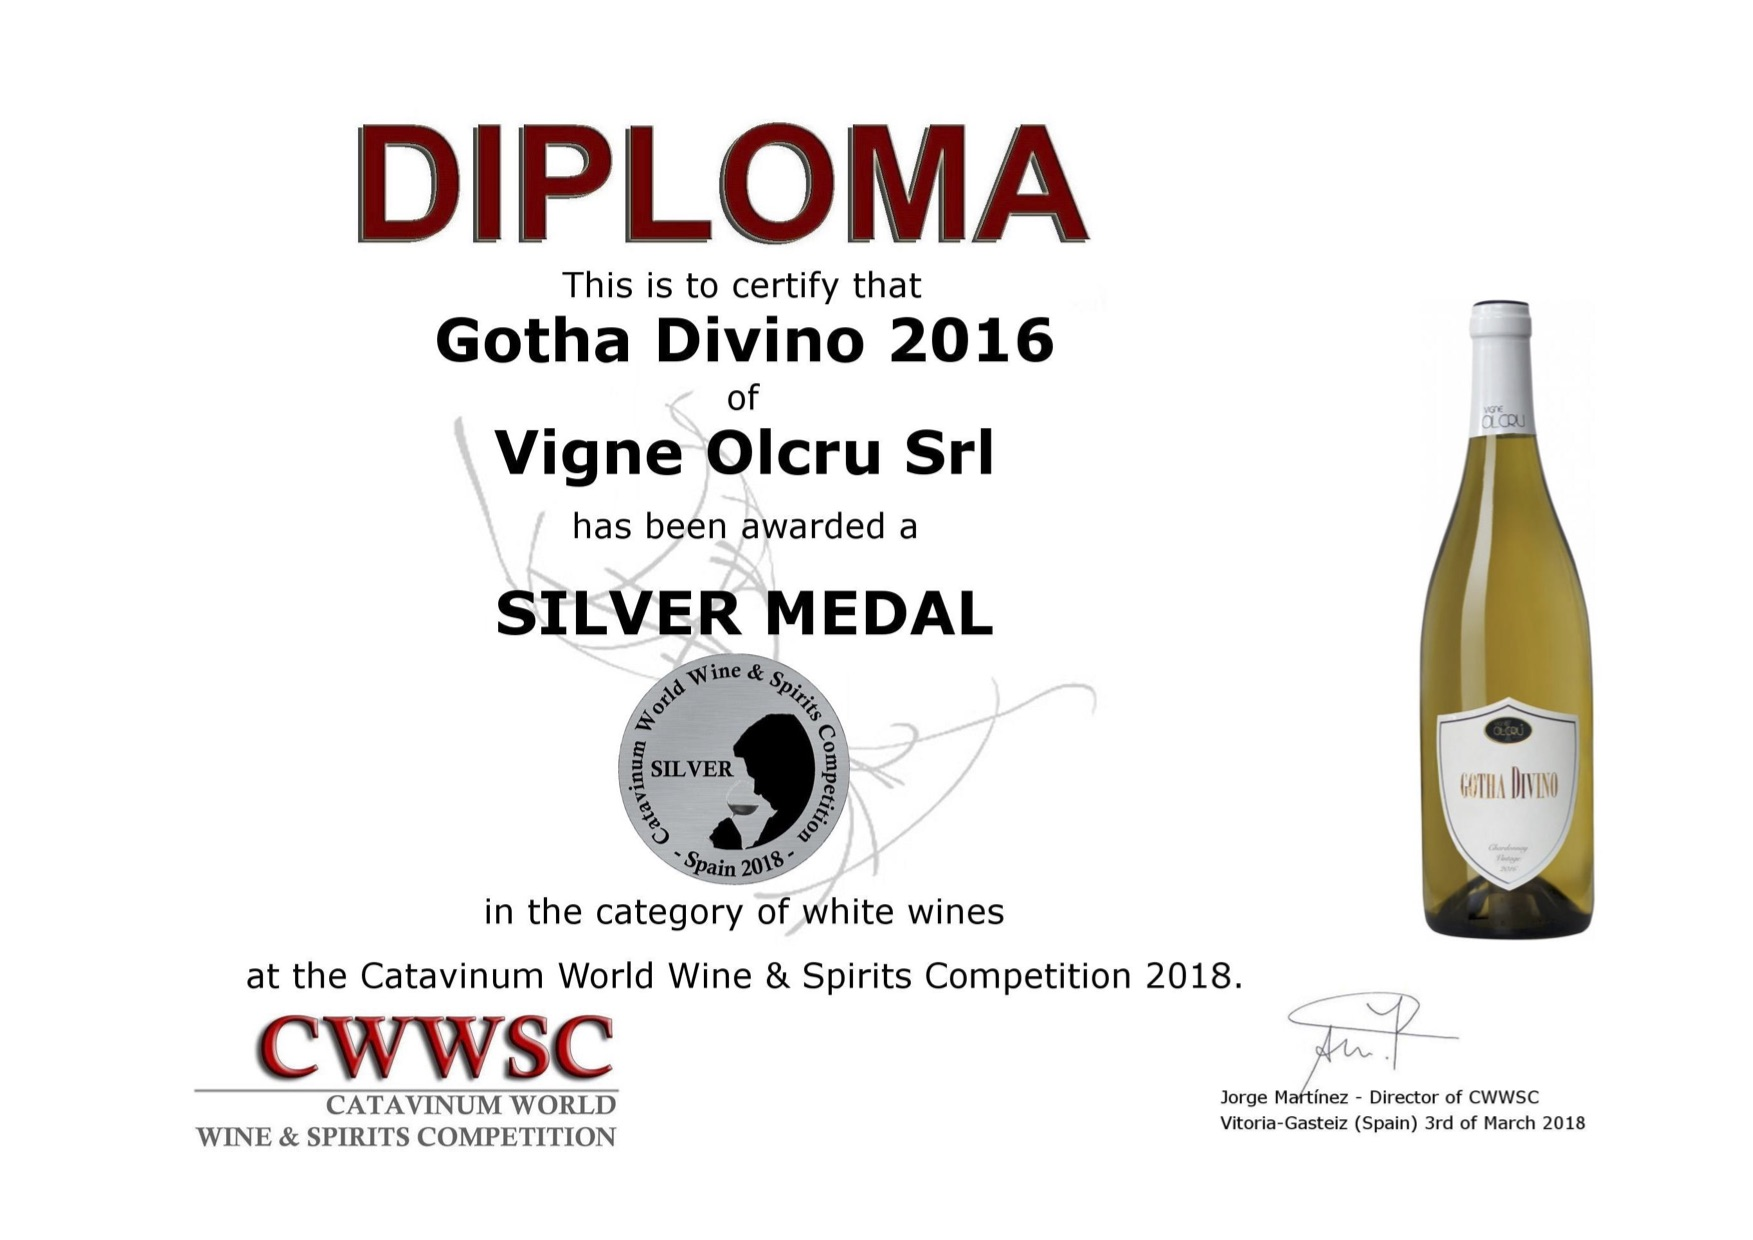 CWWSC 2018 Spagna – Gotha Divino 2016